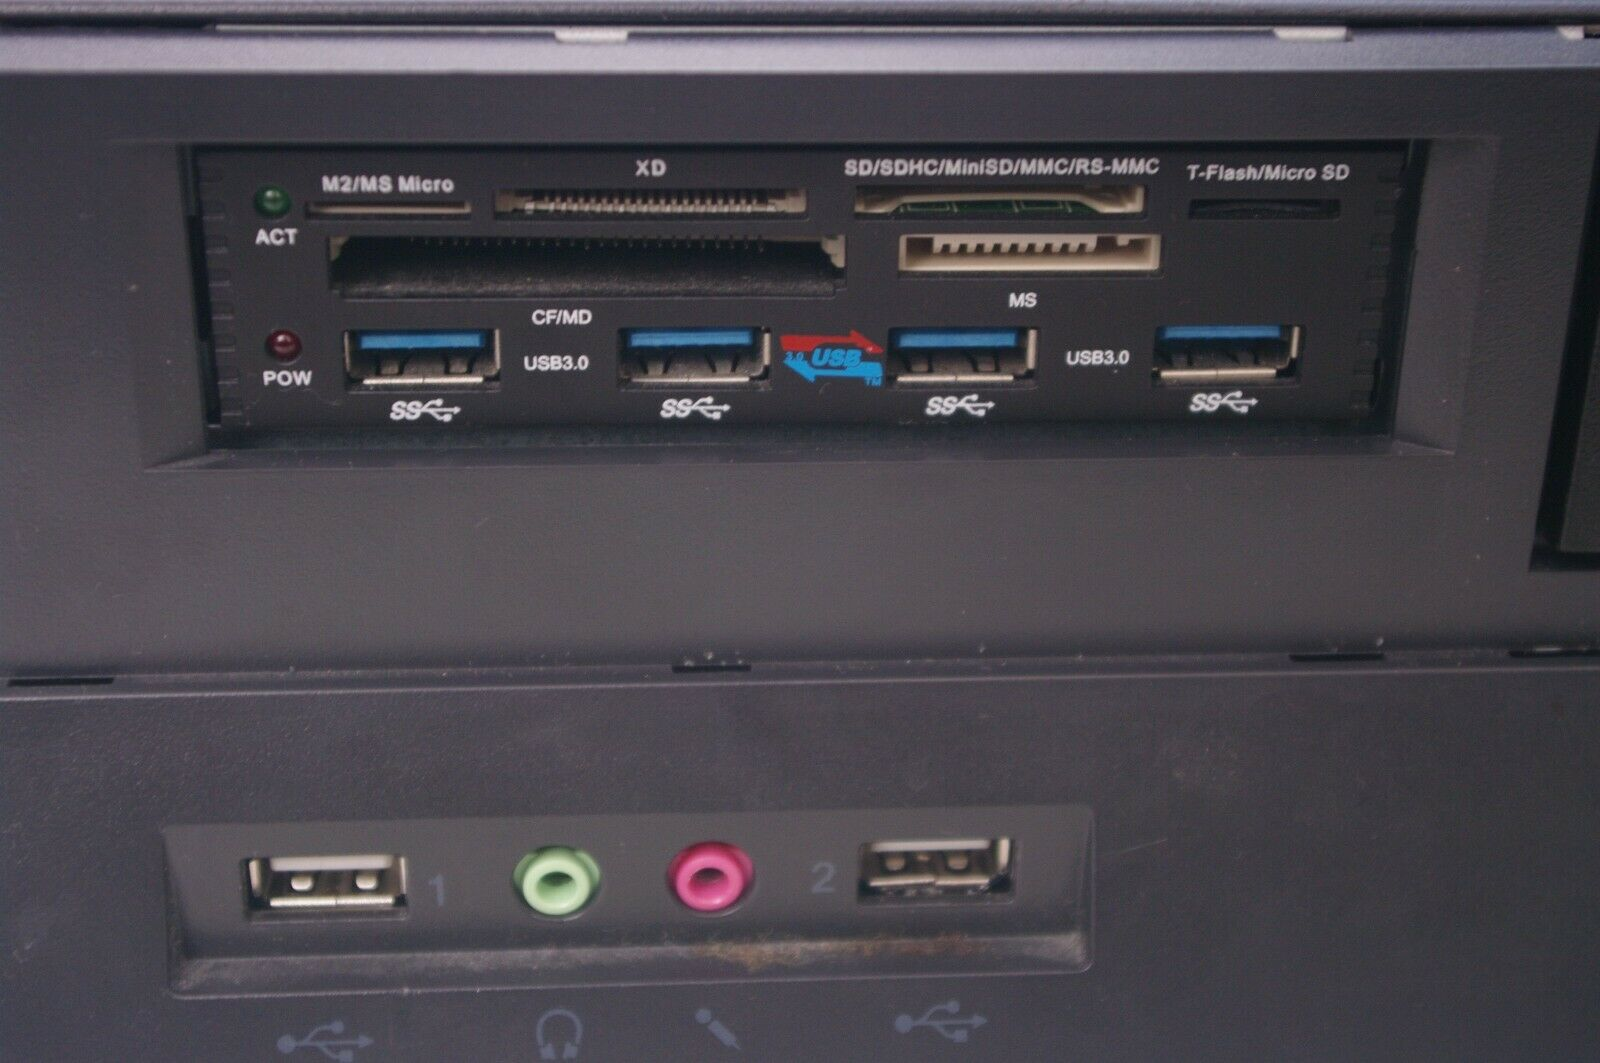 Computer Games - Black Friday Deal - Fast Cheap Gaming Computer PC Bundle Desktop SFF AMD